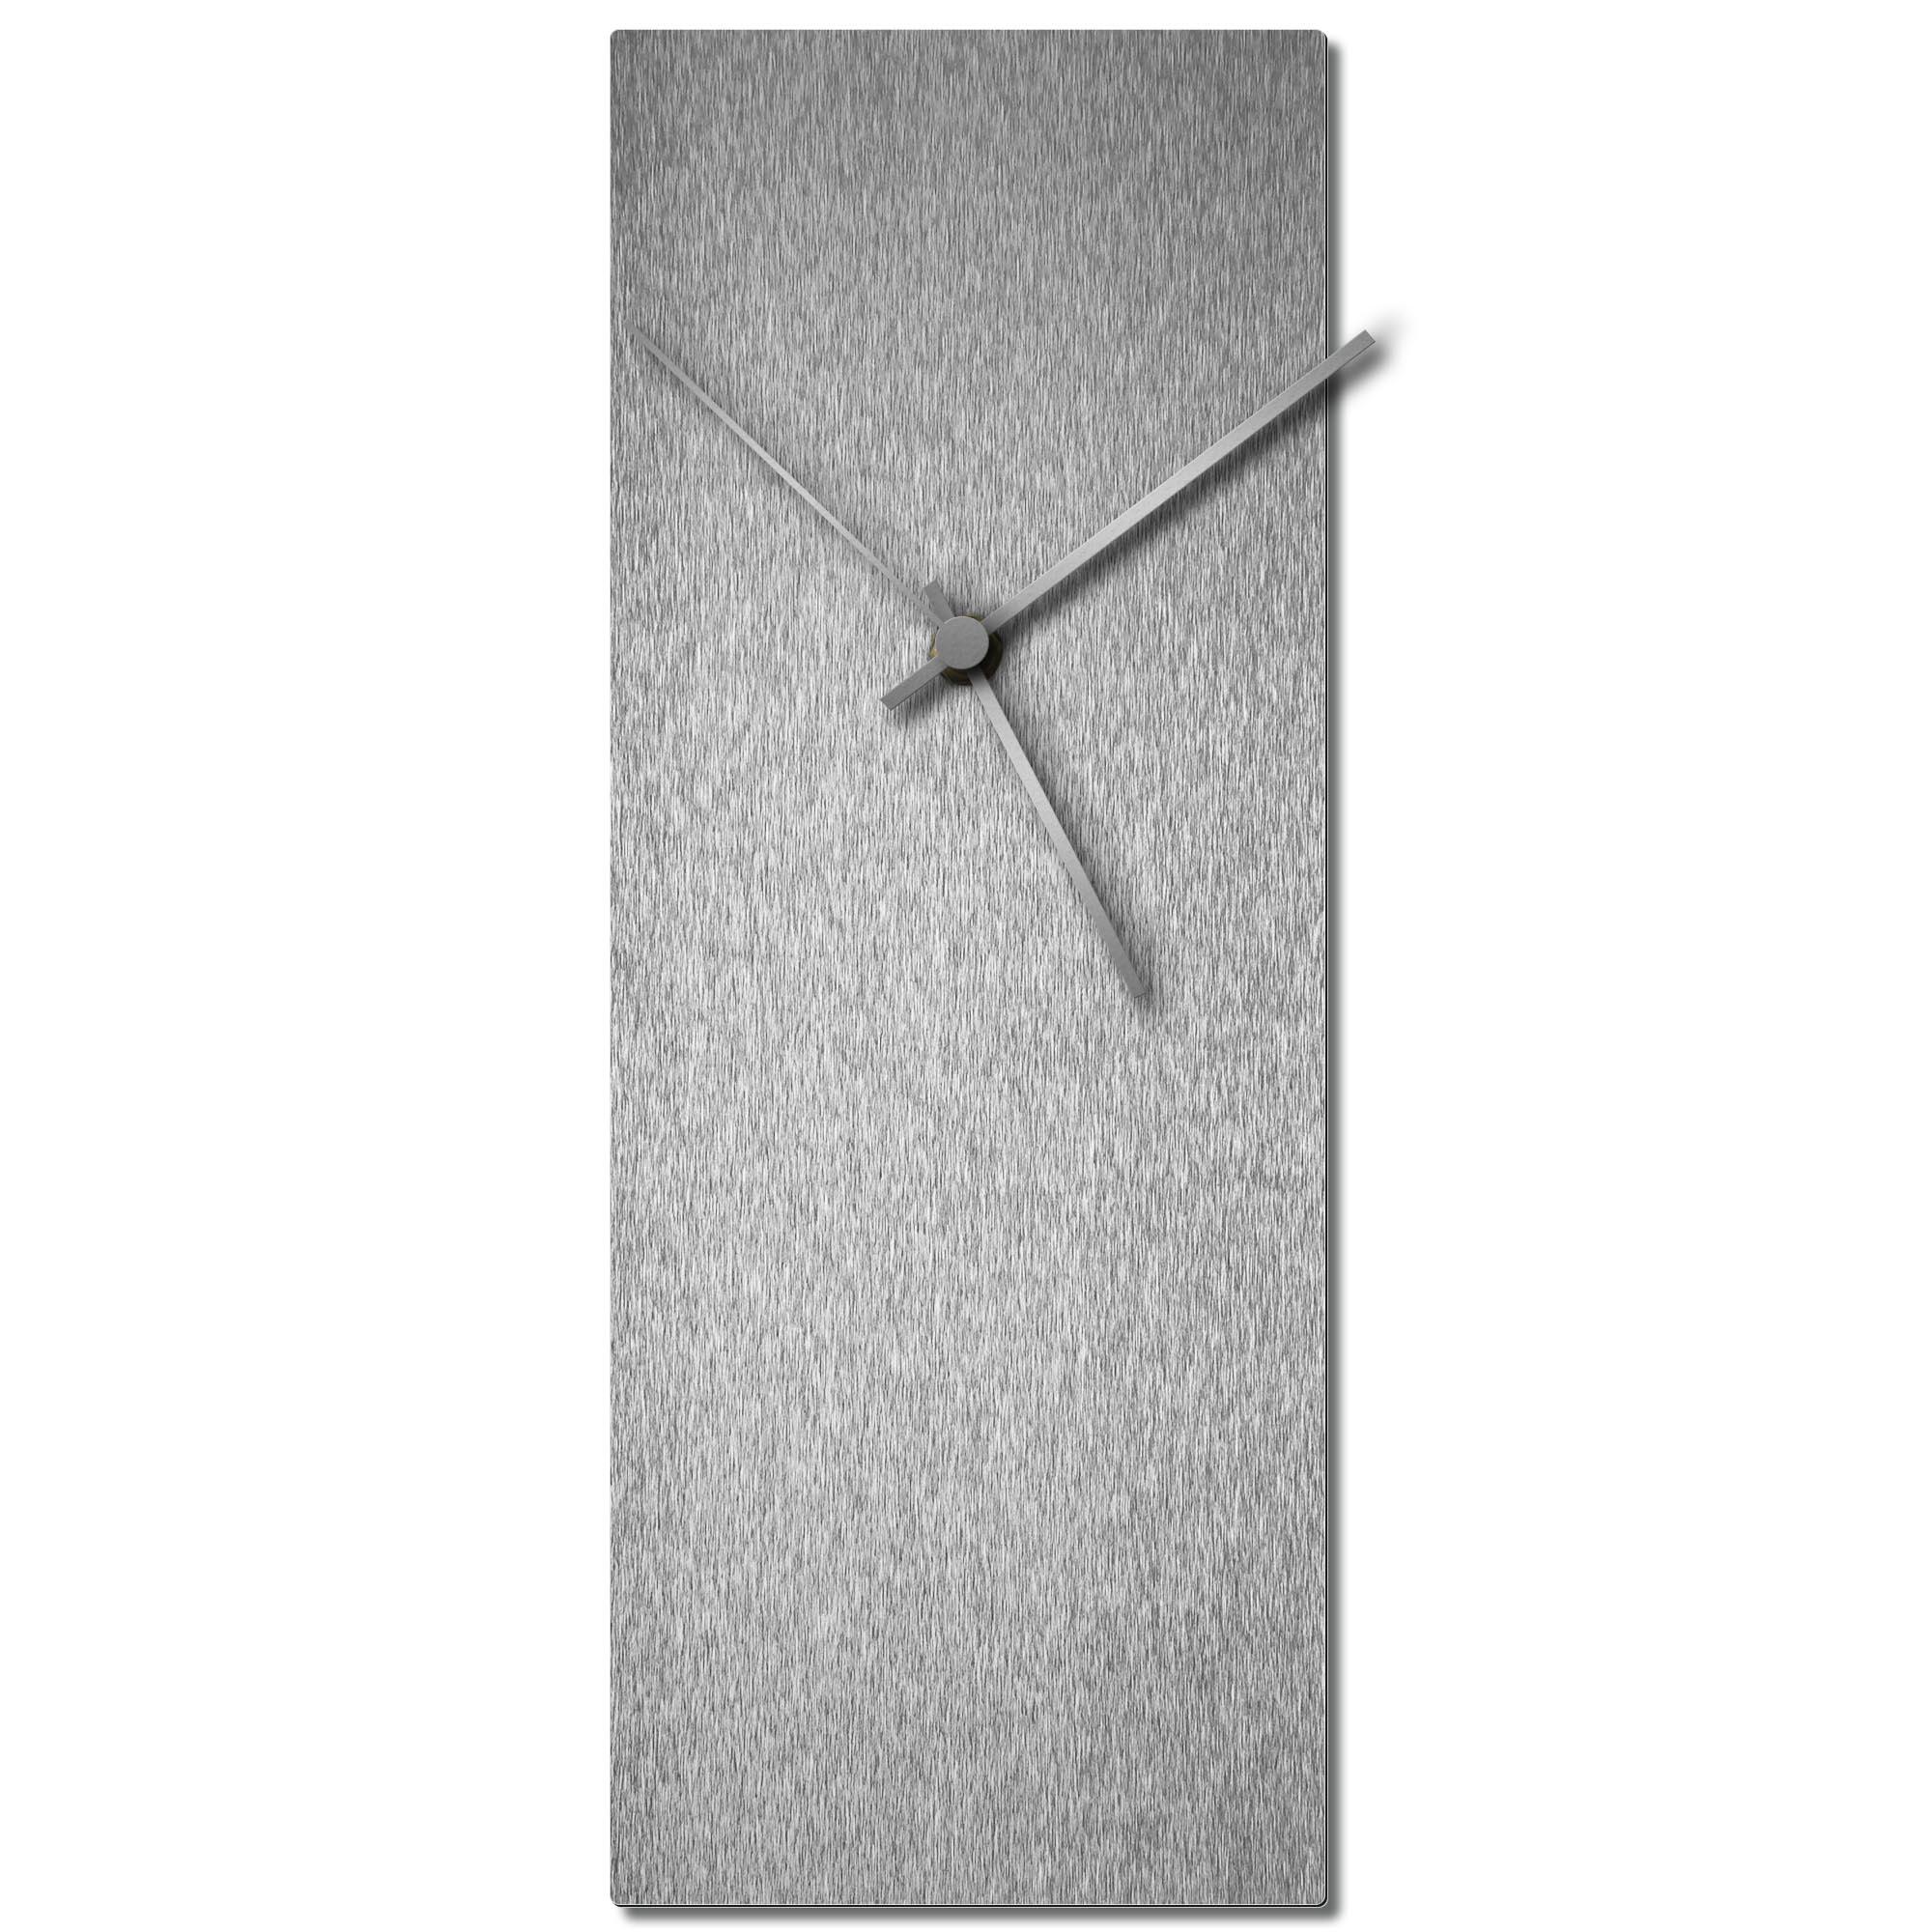 Adam Schwoeppe 'Silversmith Clock Large Silver' Midcentury Modern Style Wall Clock